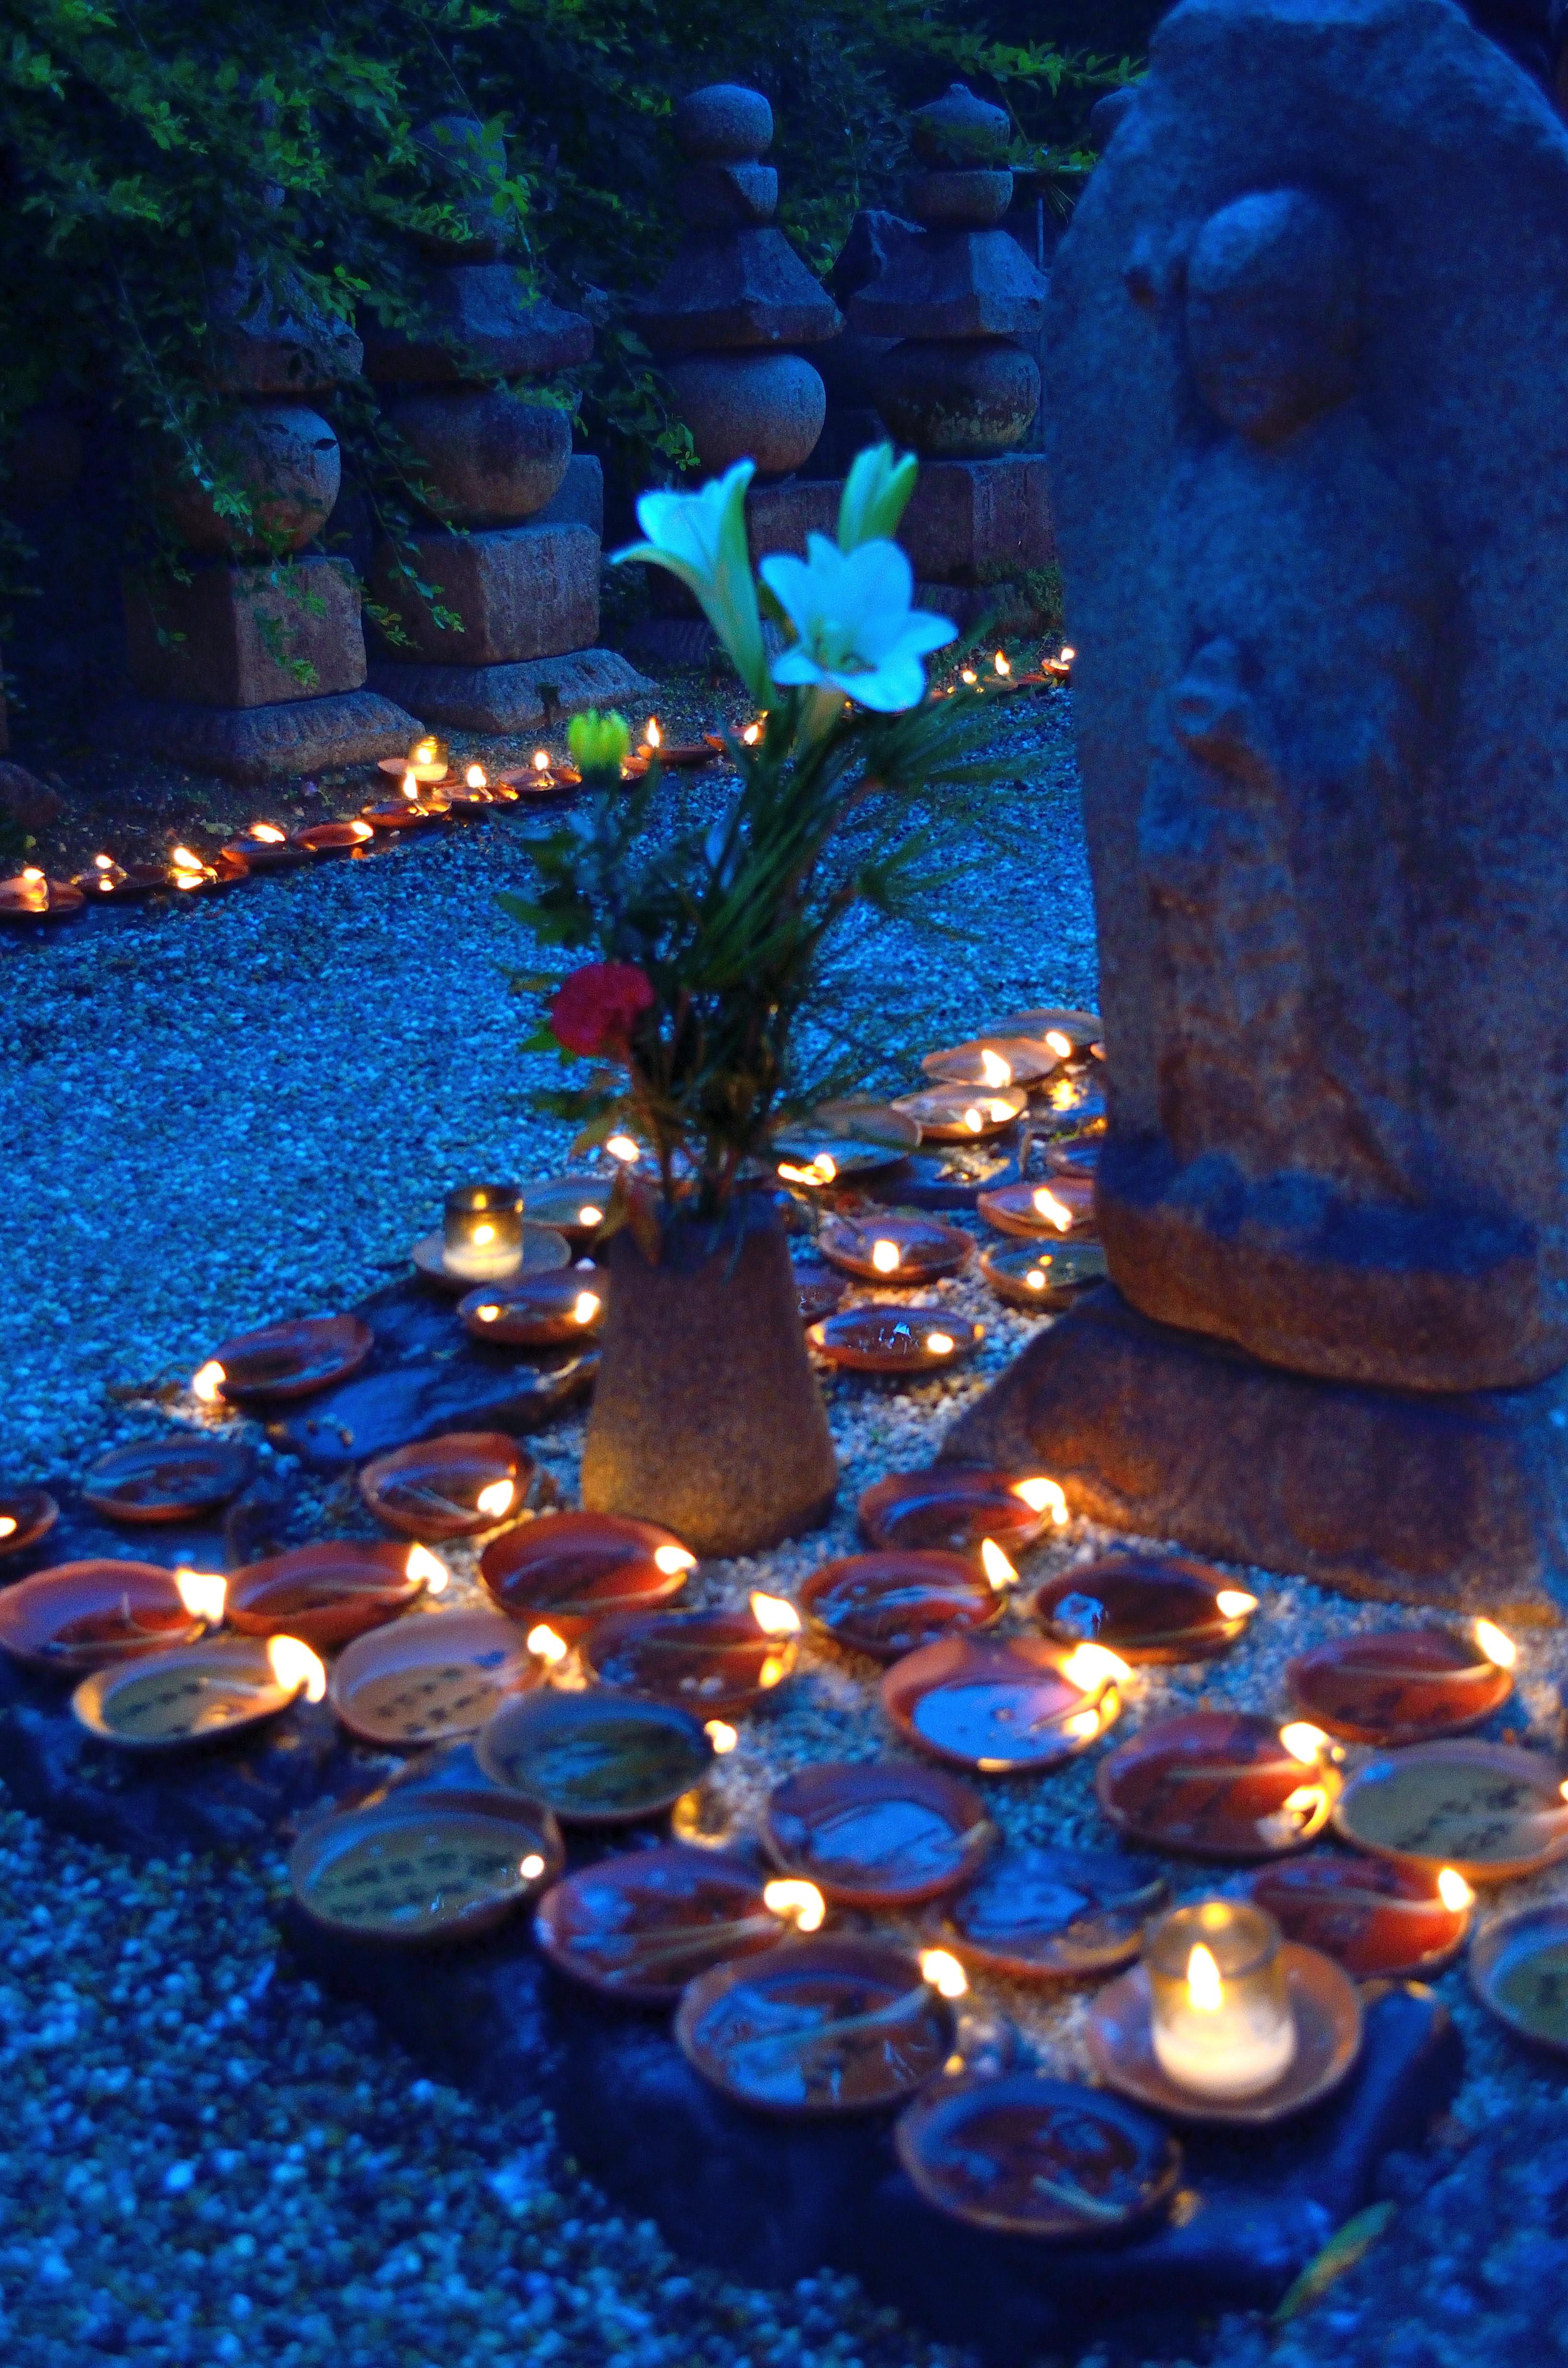 元興寺地蔵会万灯供養 夕暮れと地蔵と灯明